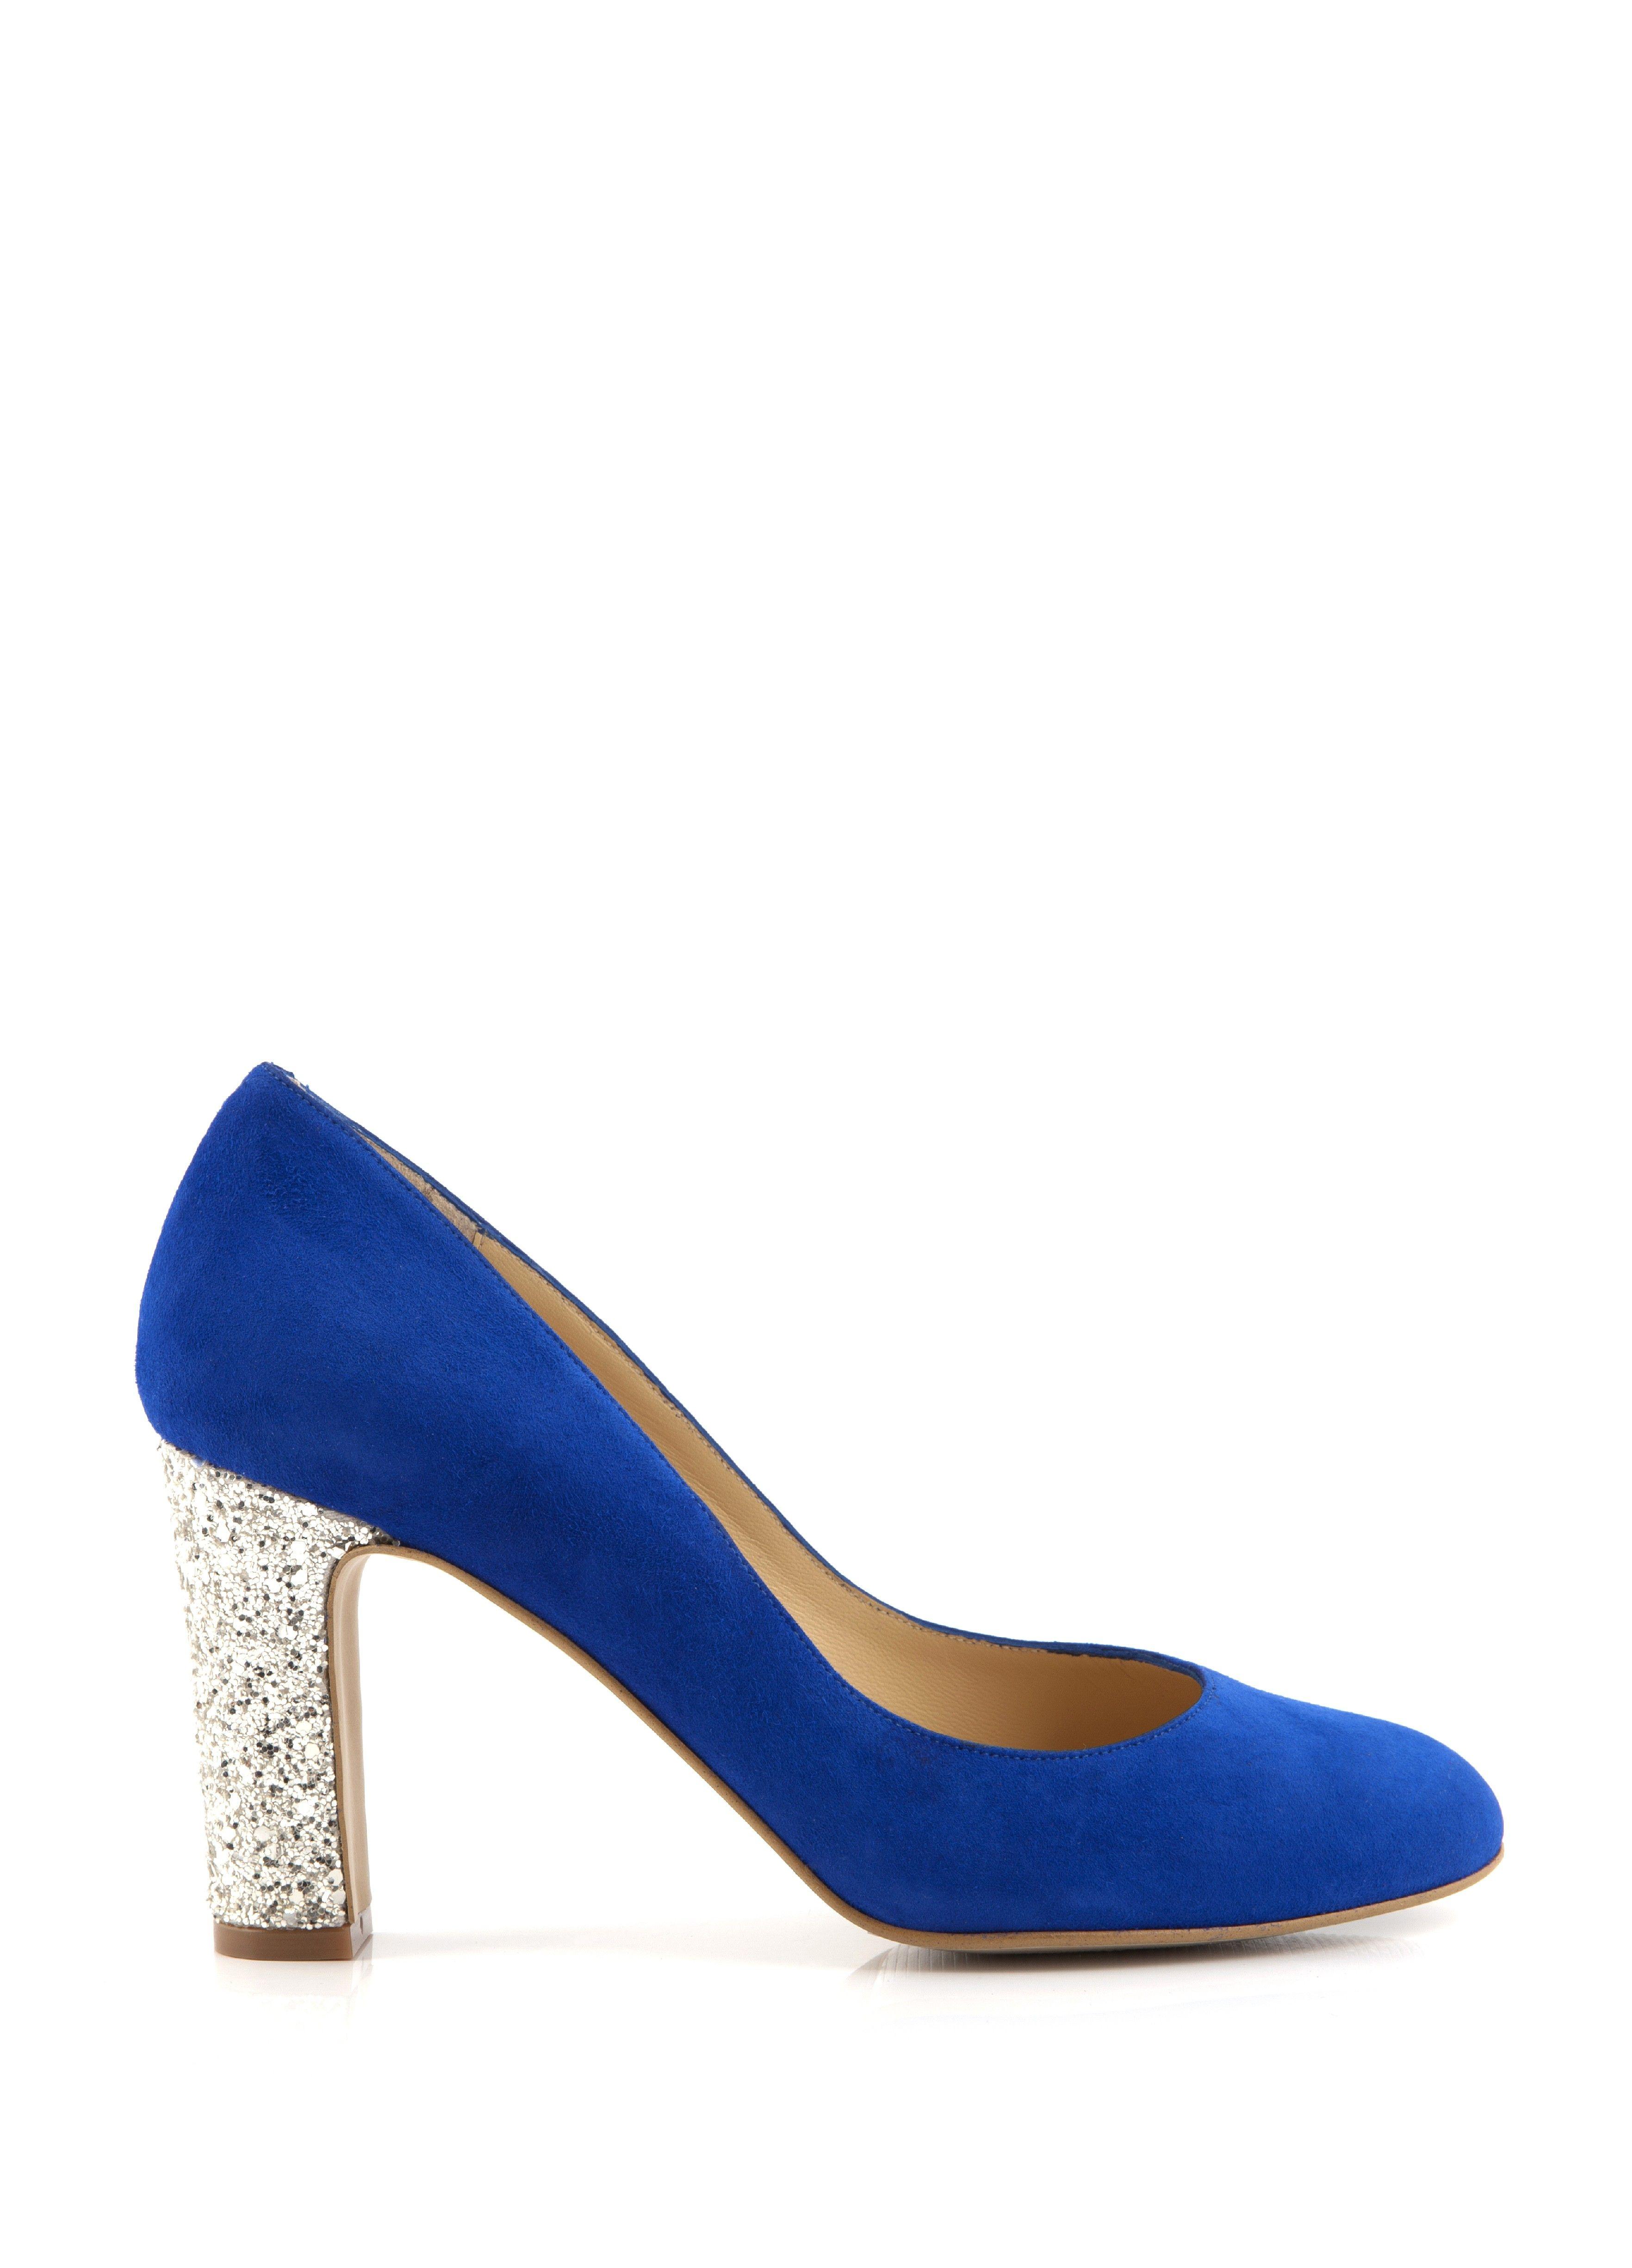 Chaussures Femme Bleu Roi Femme Chaussures Sandales A